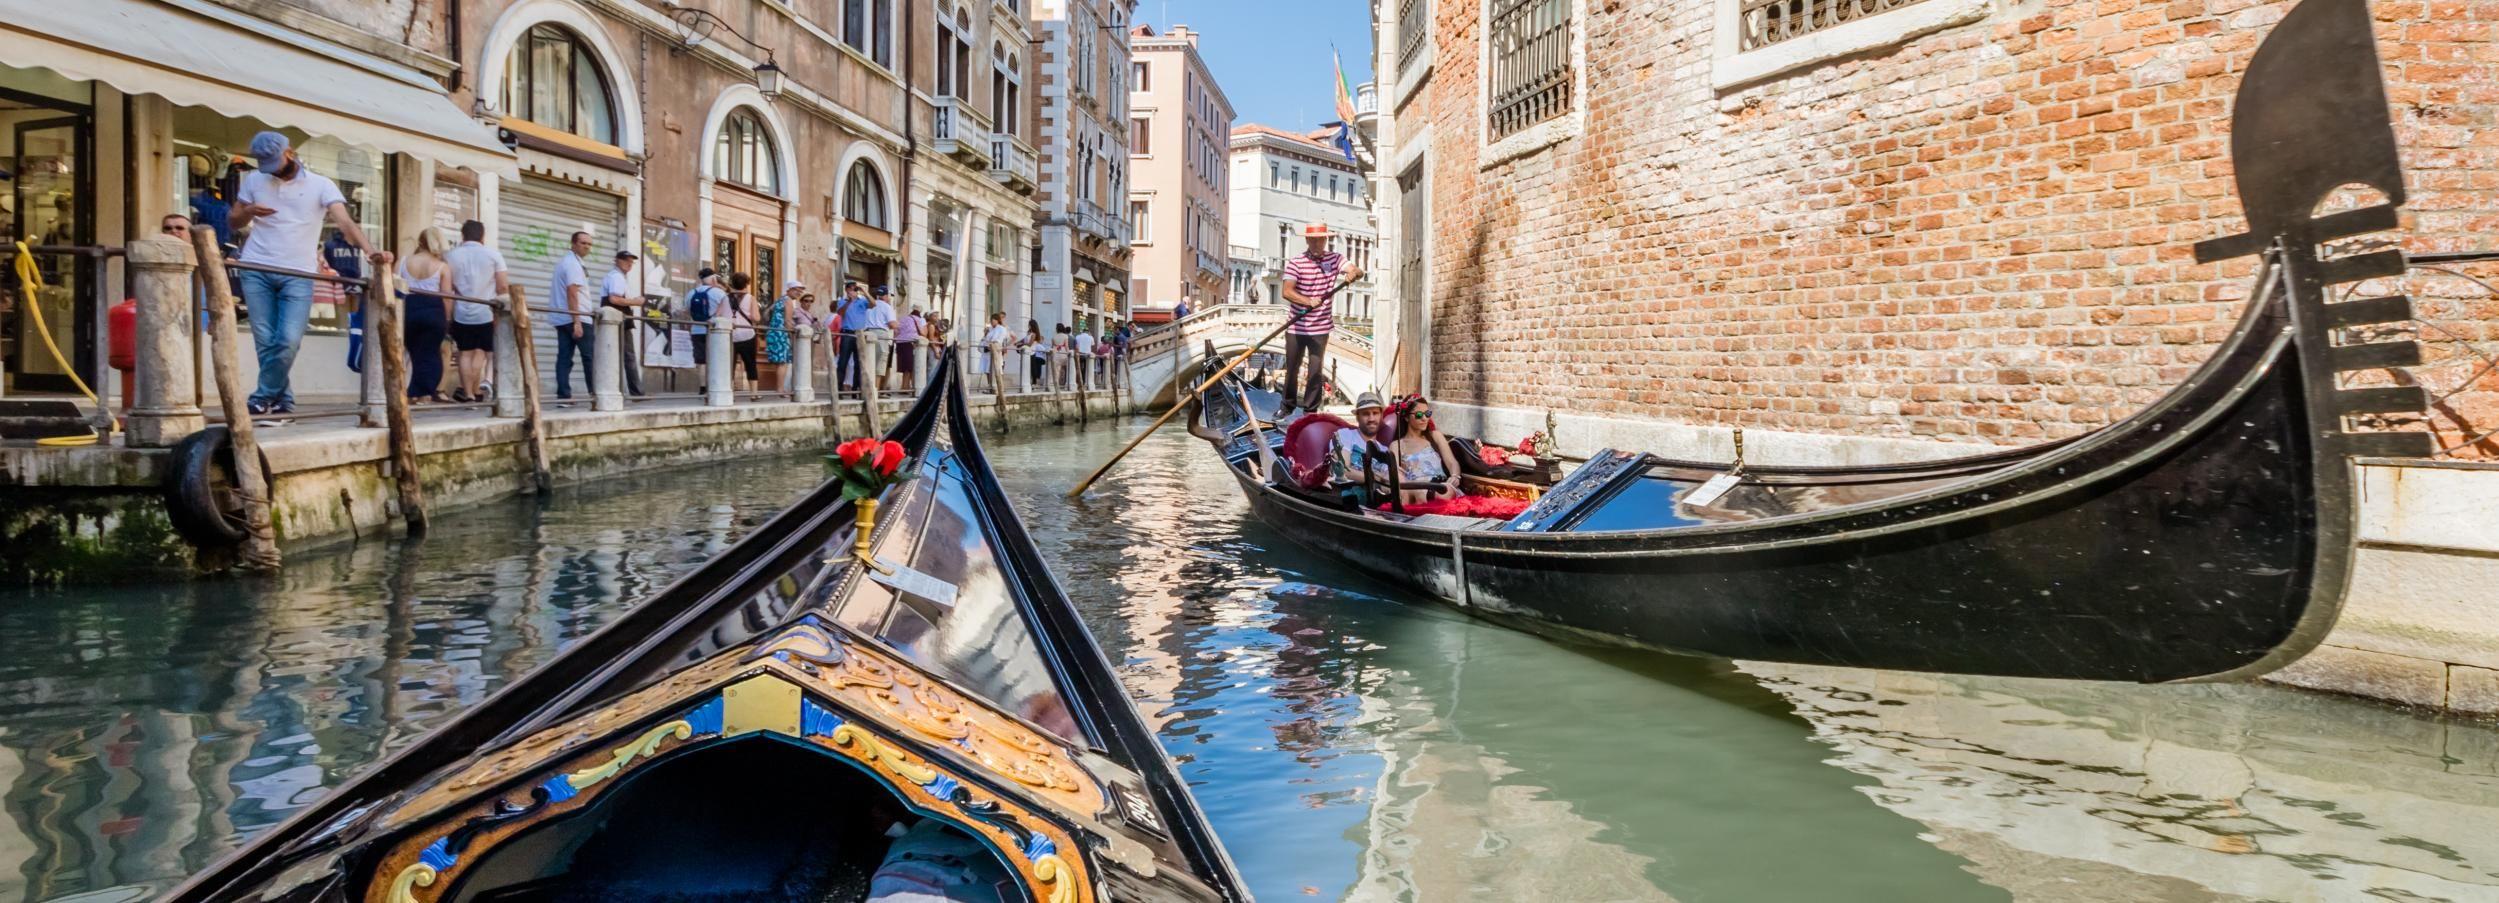 Venezia: giro in gondola condivisa sul Canal Grande